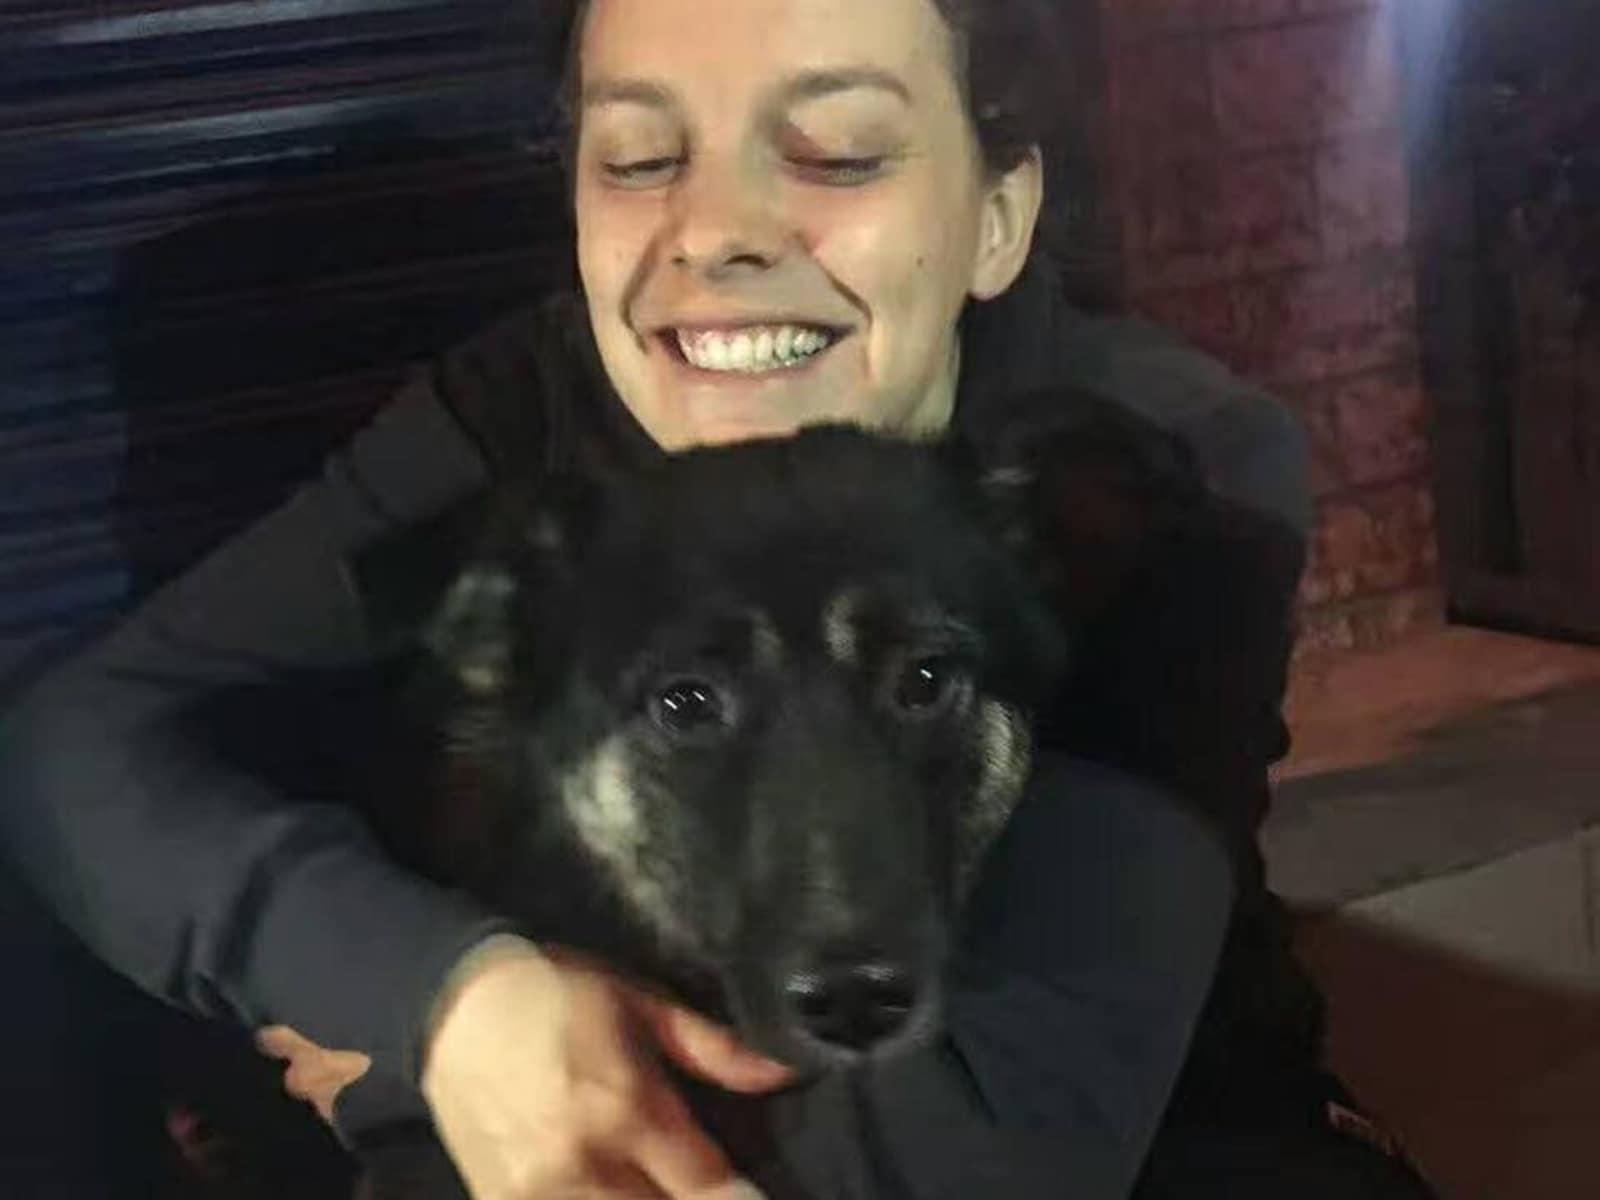 Chloe from Perth, Western Australia, Australia